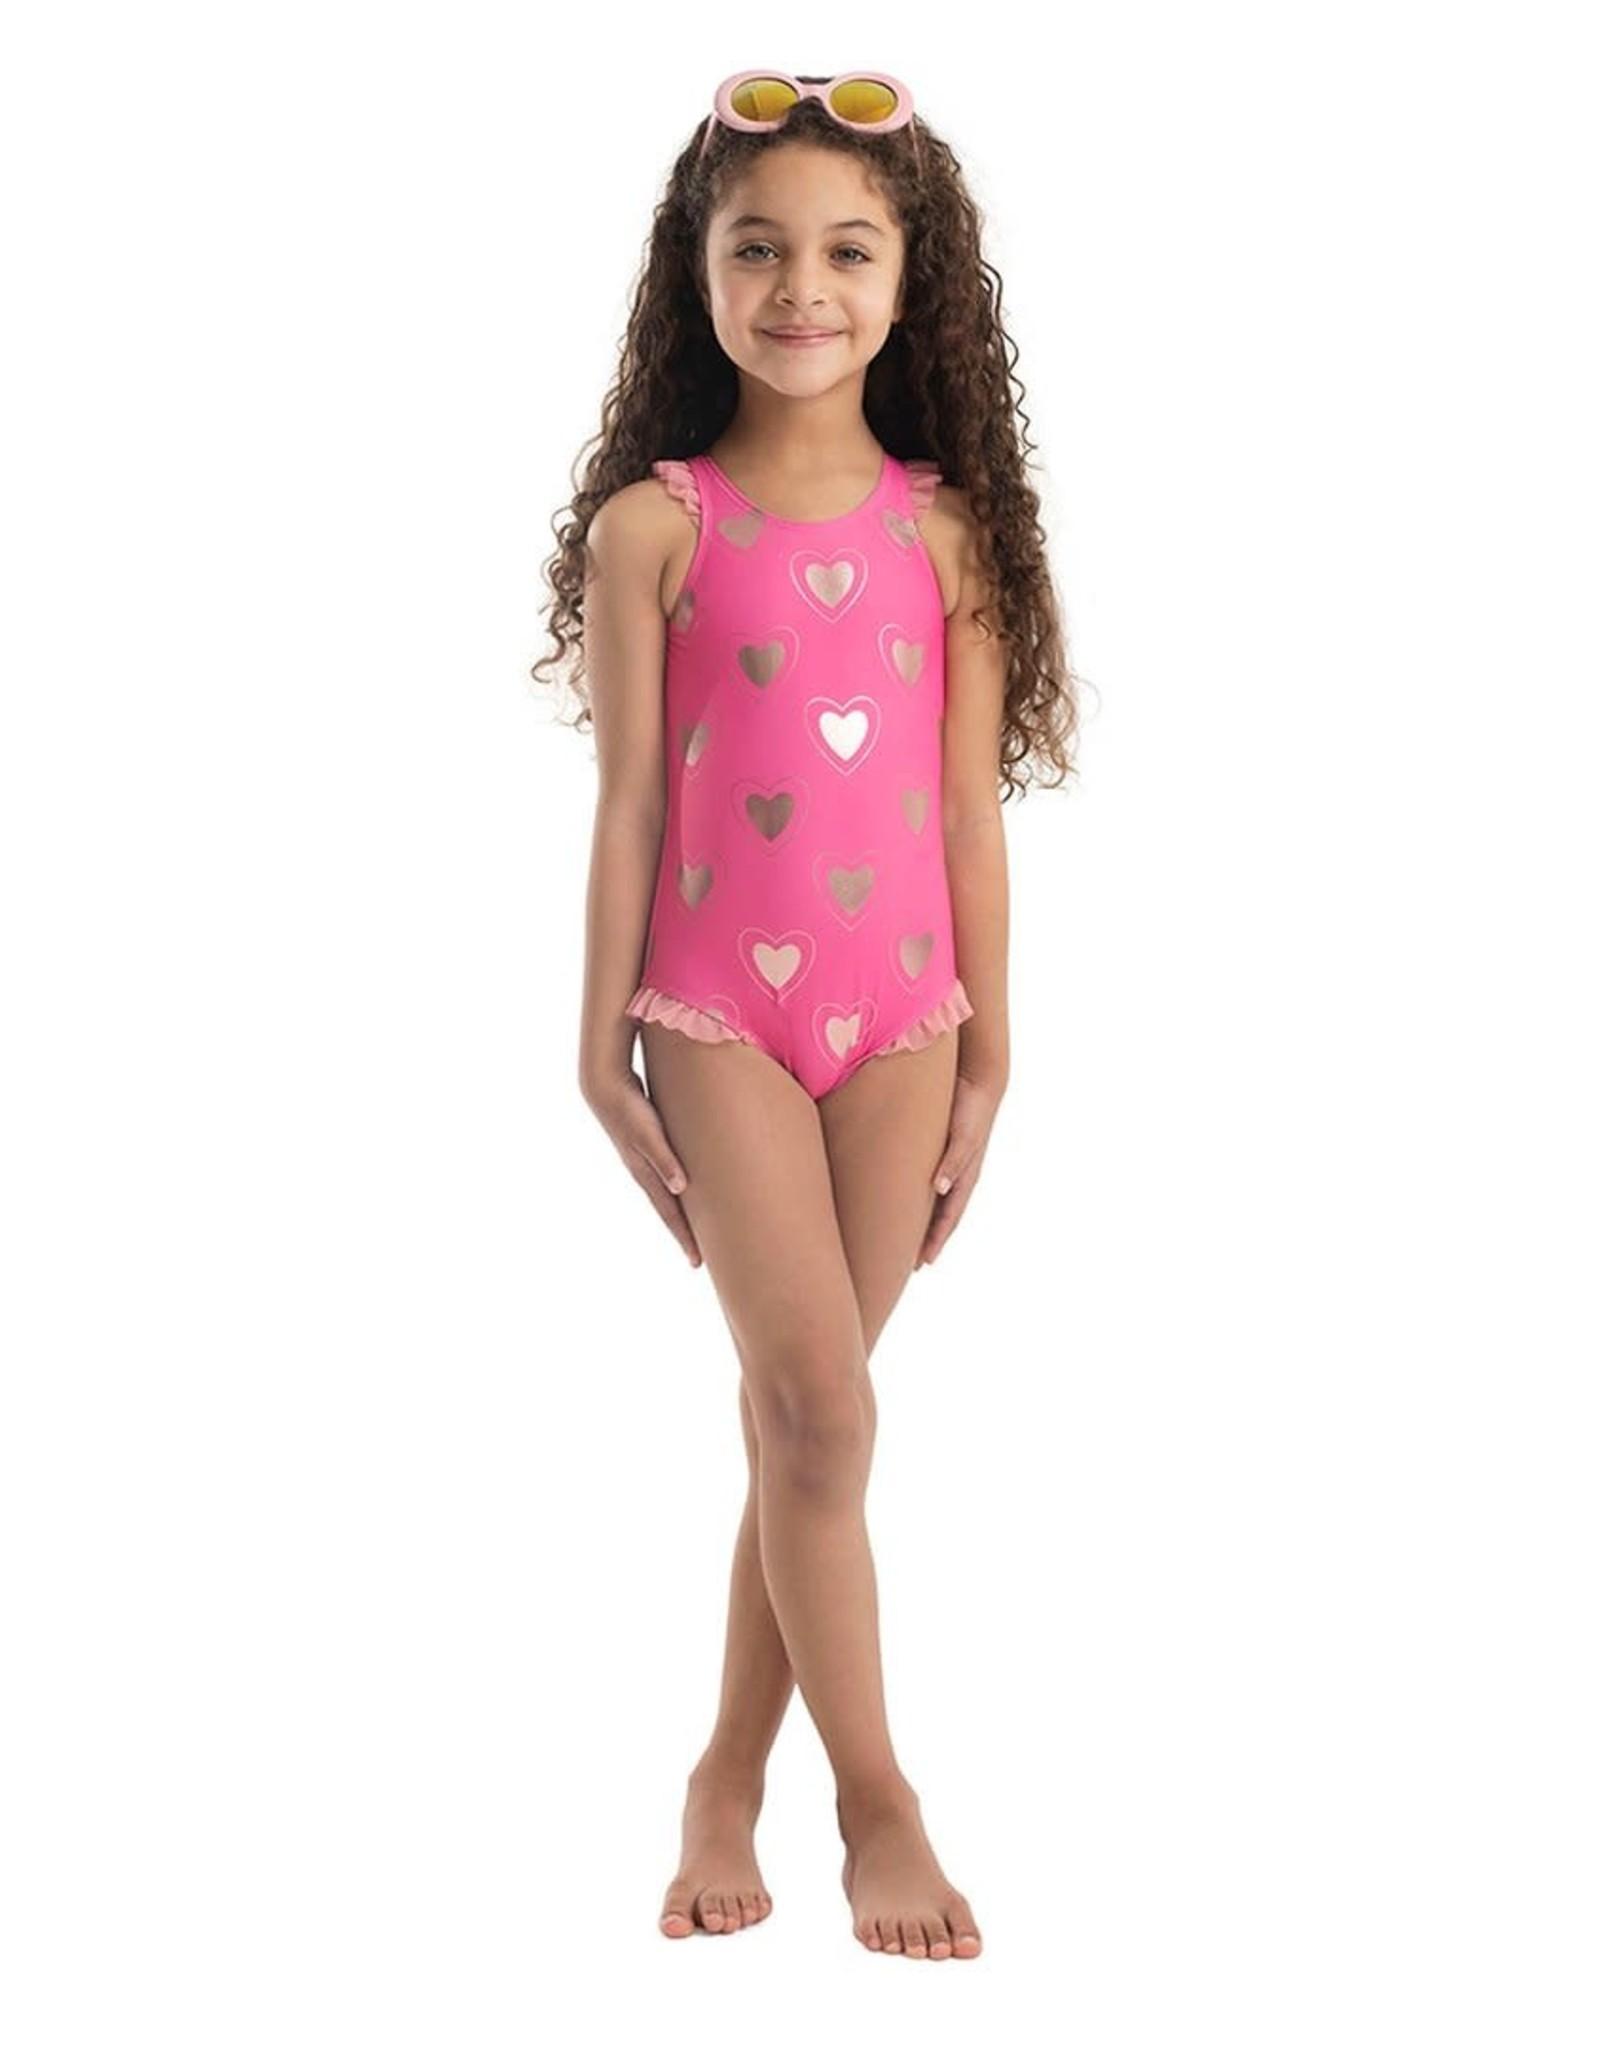 Appaman Appaman Girls Calla Swimsuit Pink Hearts